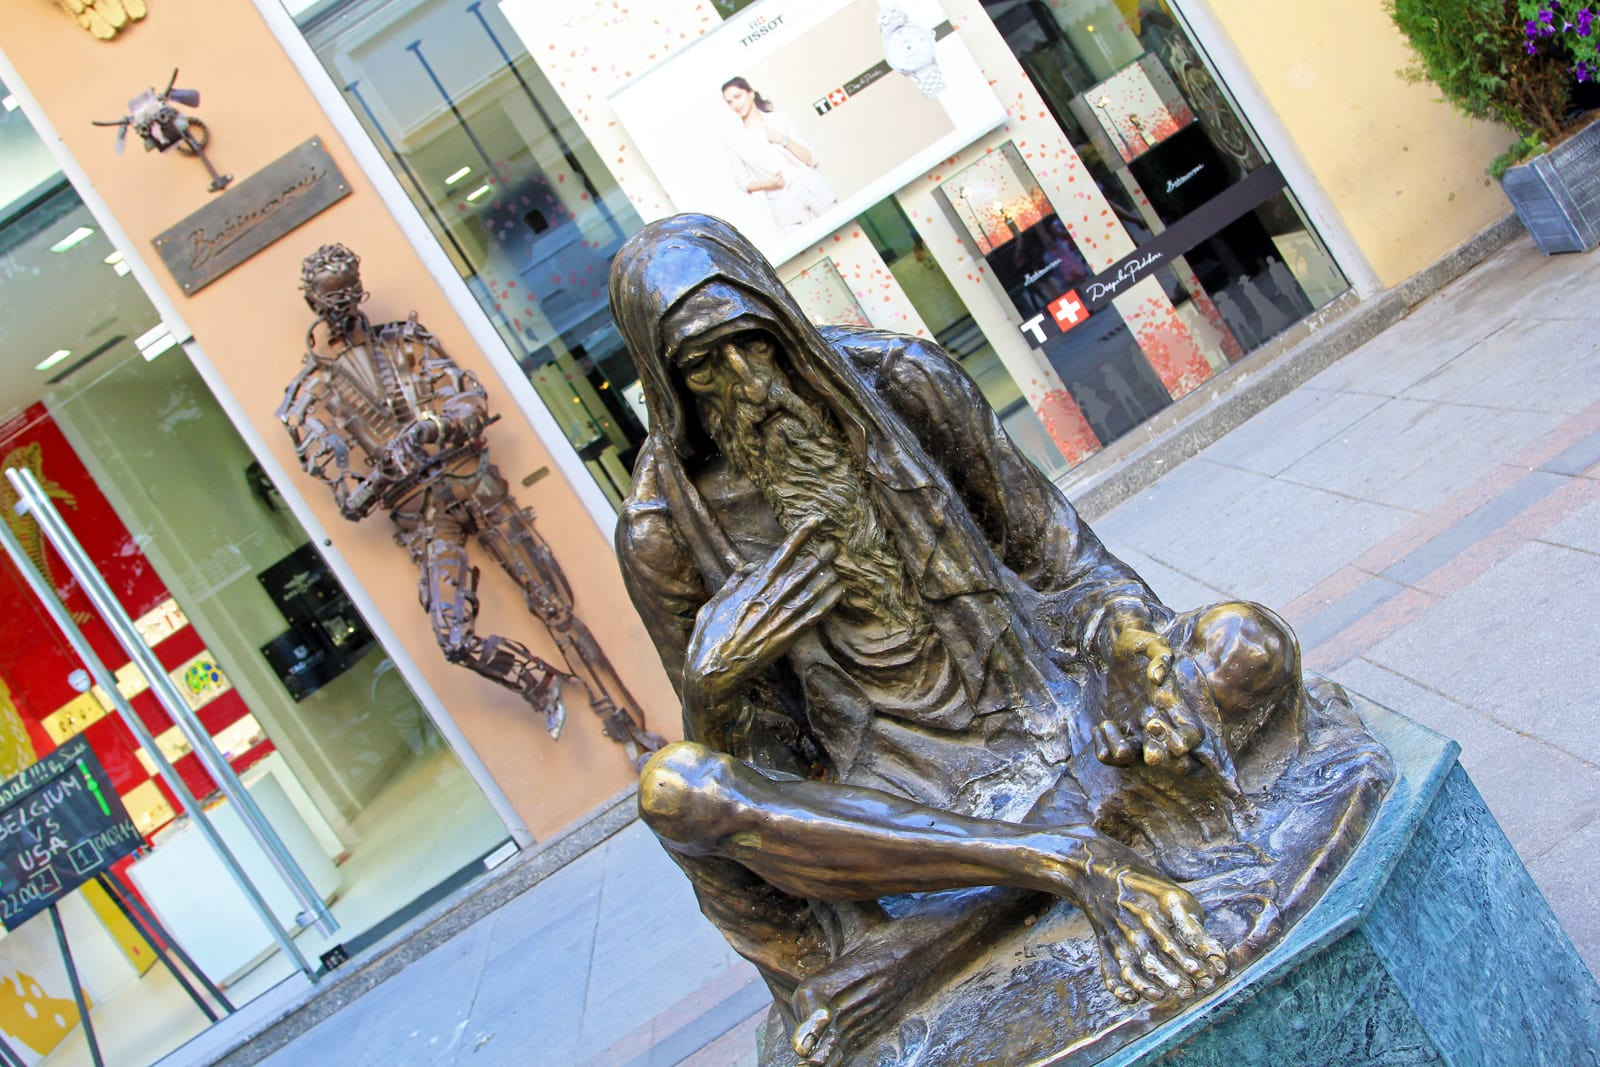 Some of the statues are pretty strange